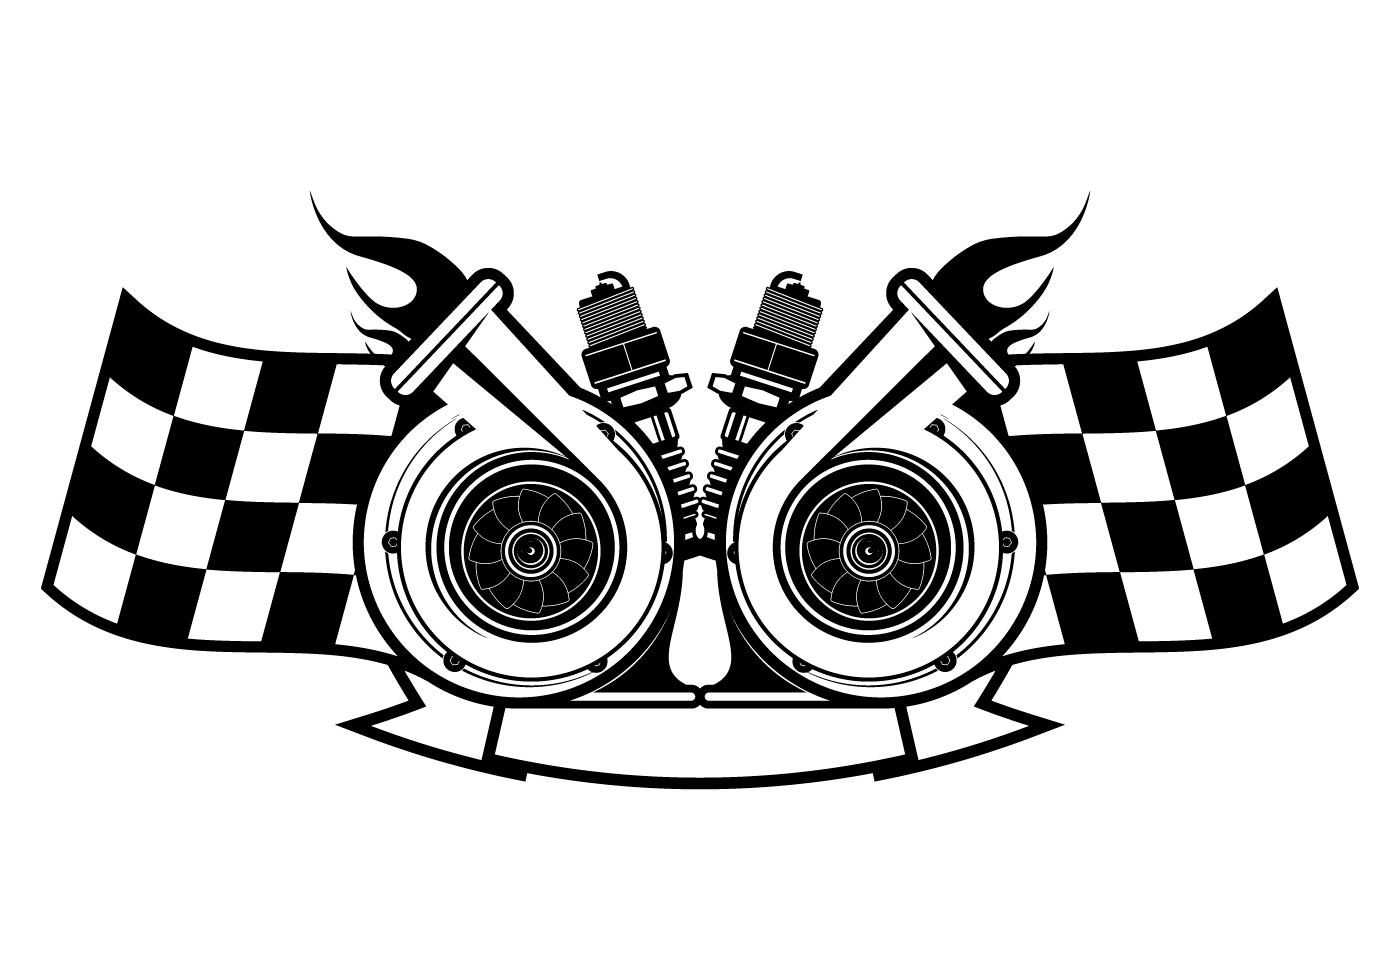 Download Turbocharger Racing Logo Template Desain Logo Otomotif Gambar Png